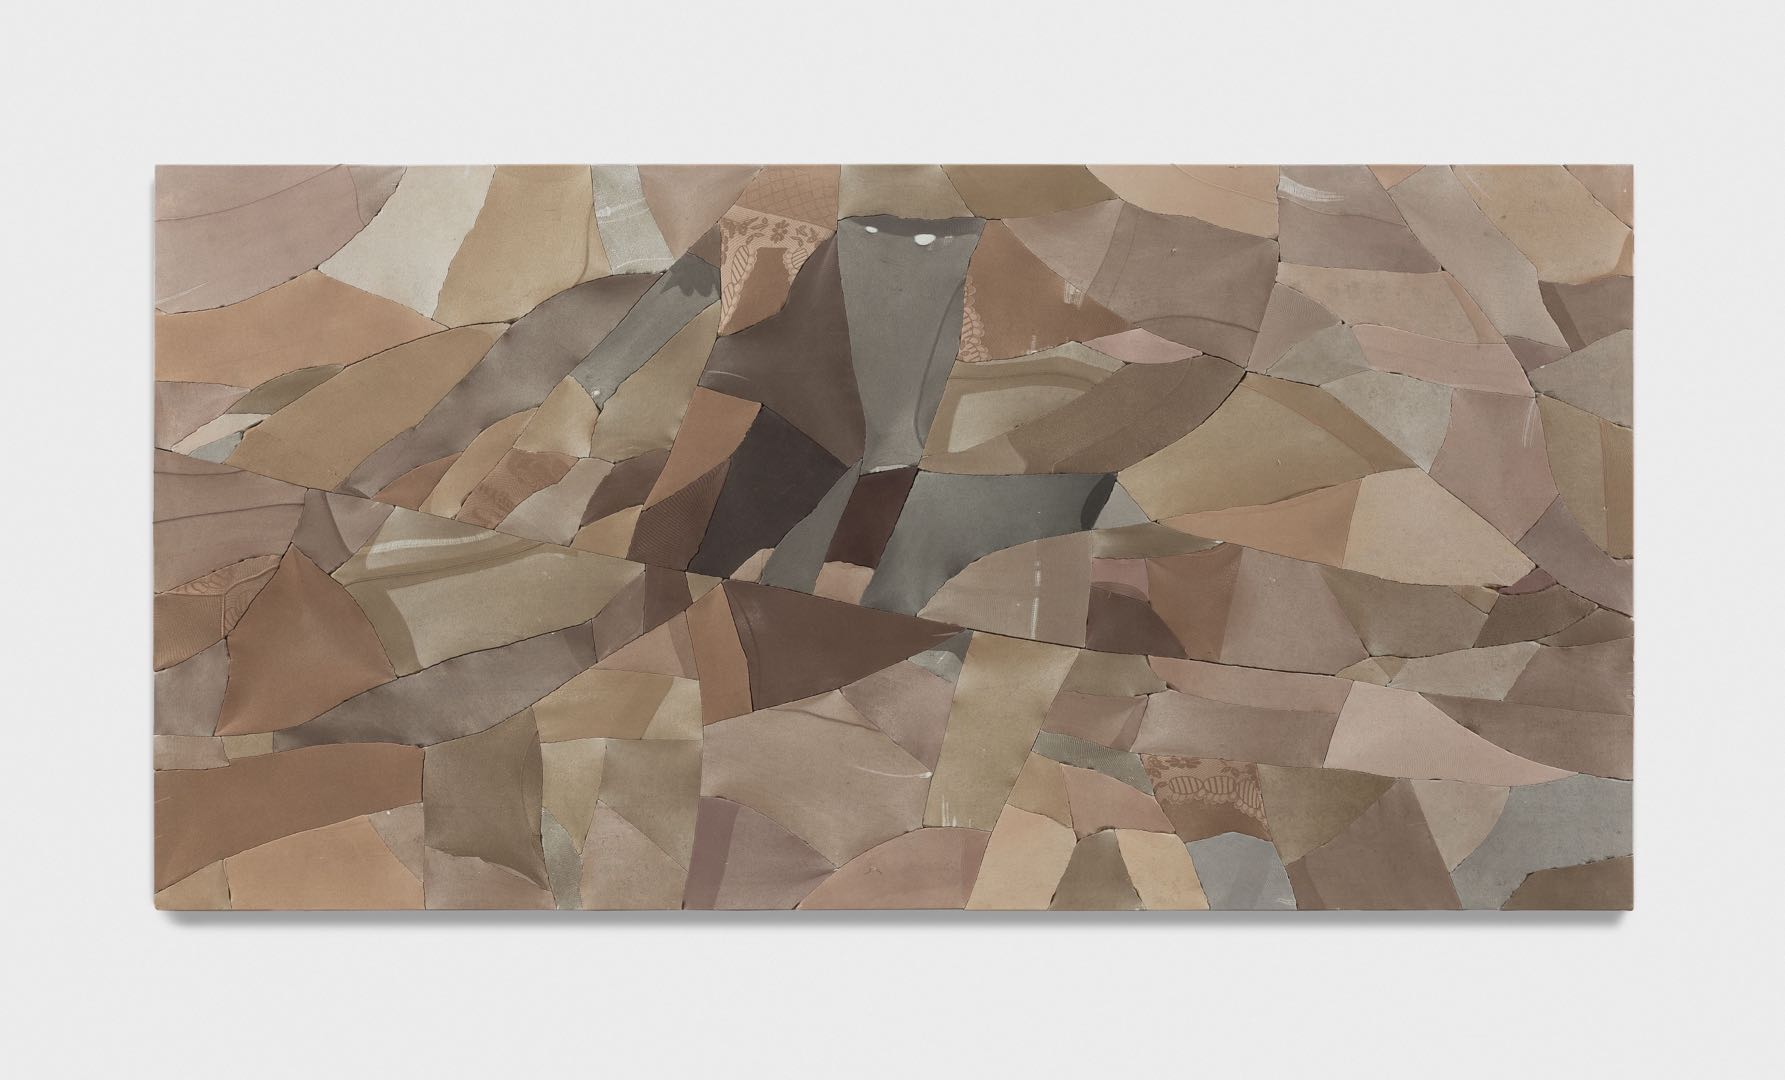 Ma Qiusha,  Wonderland /Valley , 122cmx 244cm, 2016 | Courtesy of the Artist